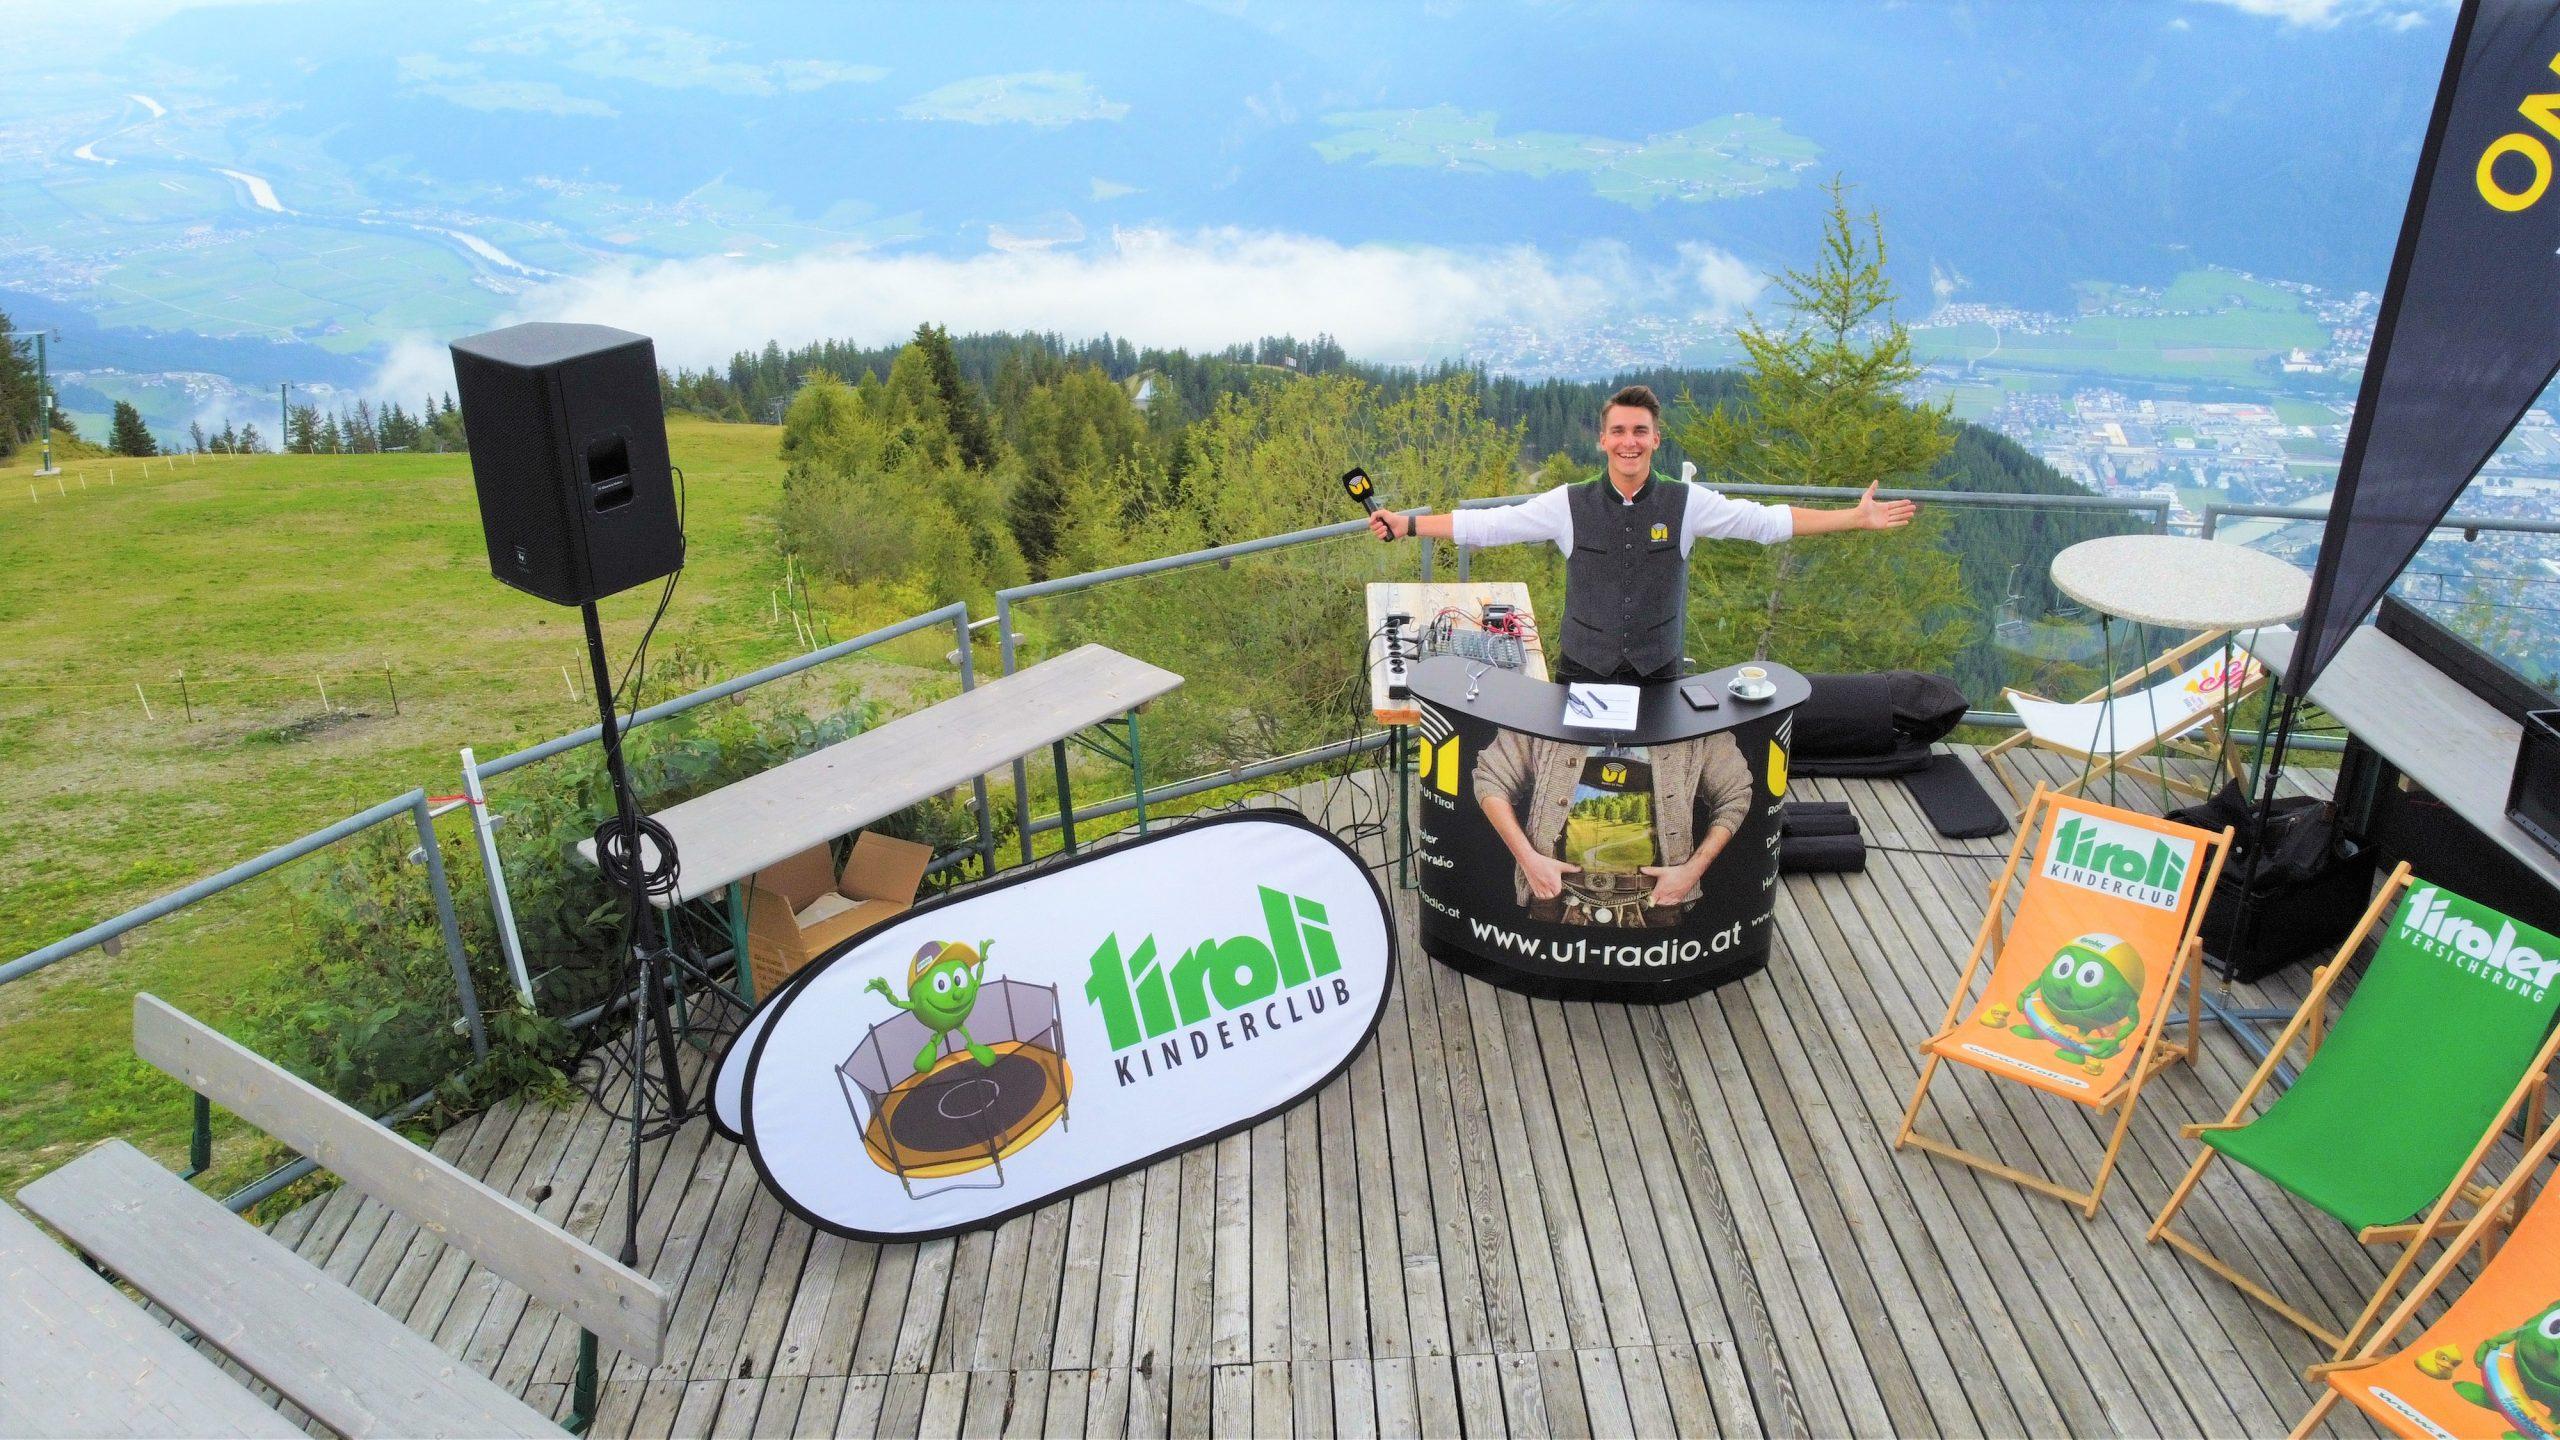 Radio U1 Tirol Schnitzeljagd